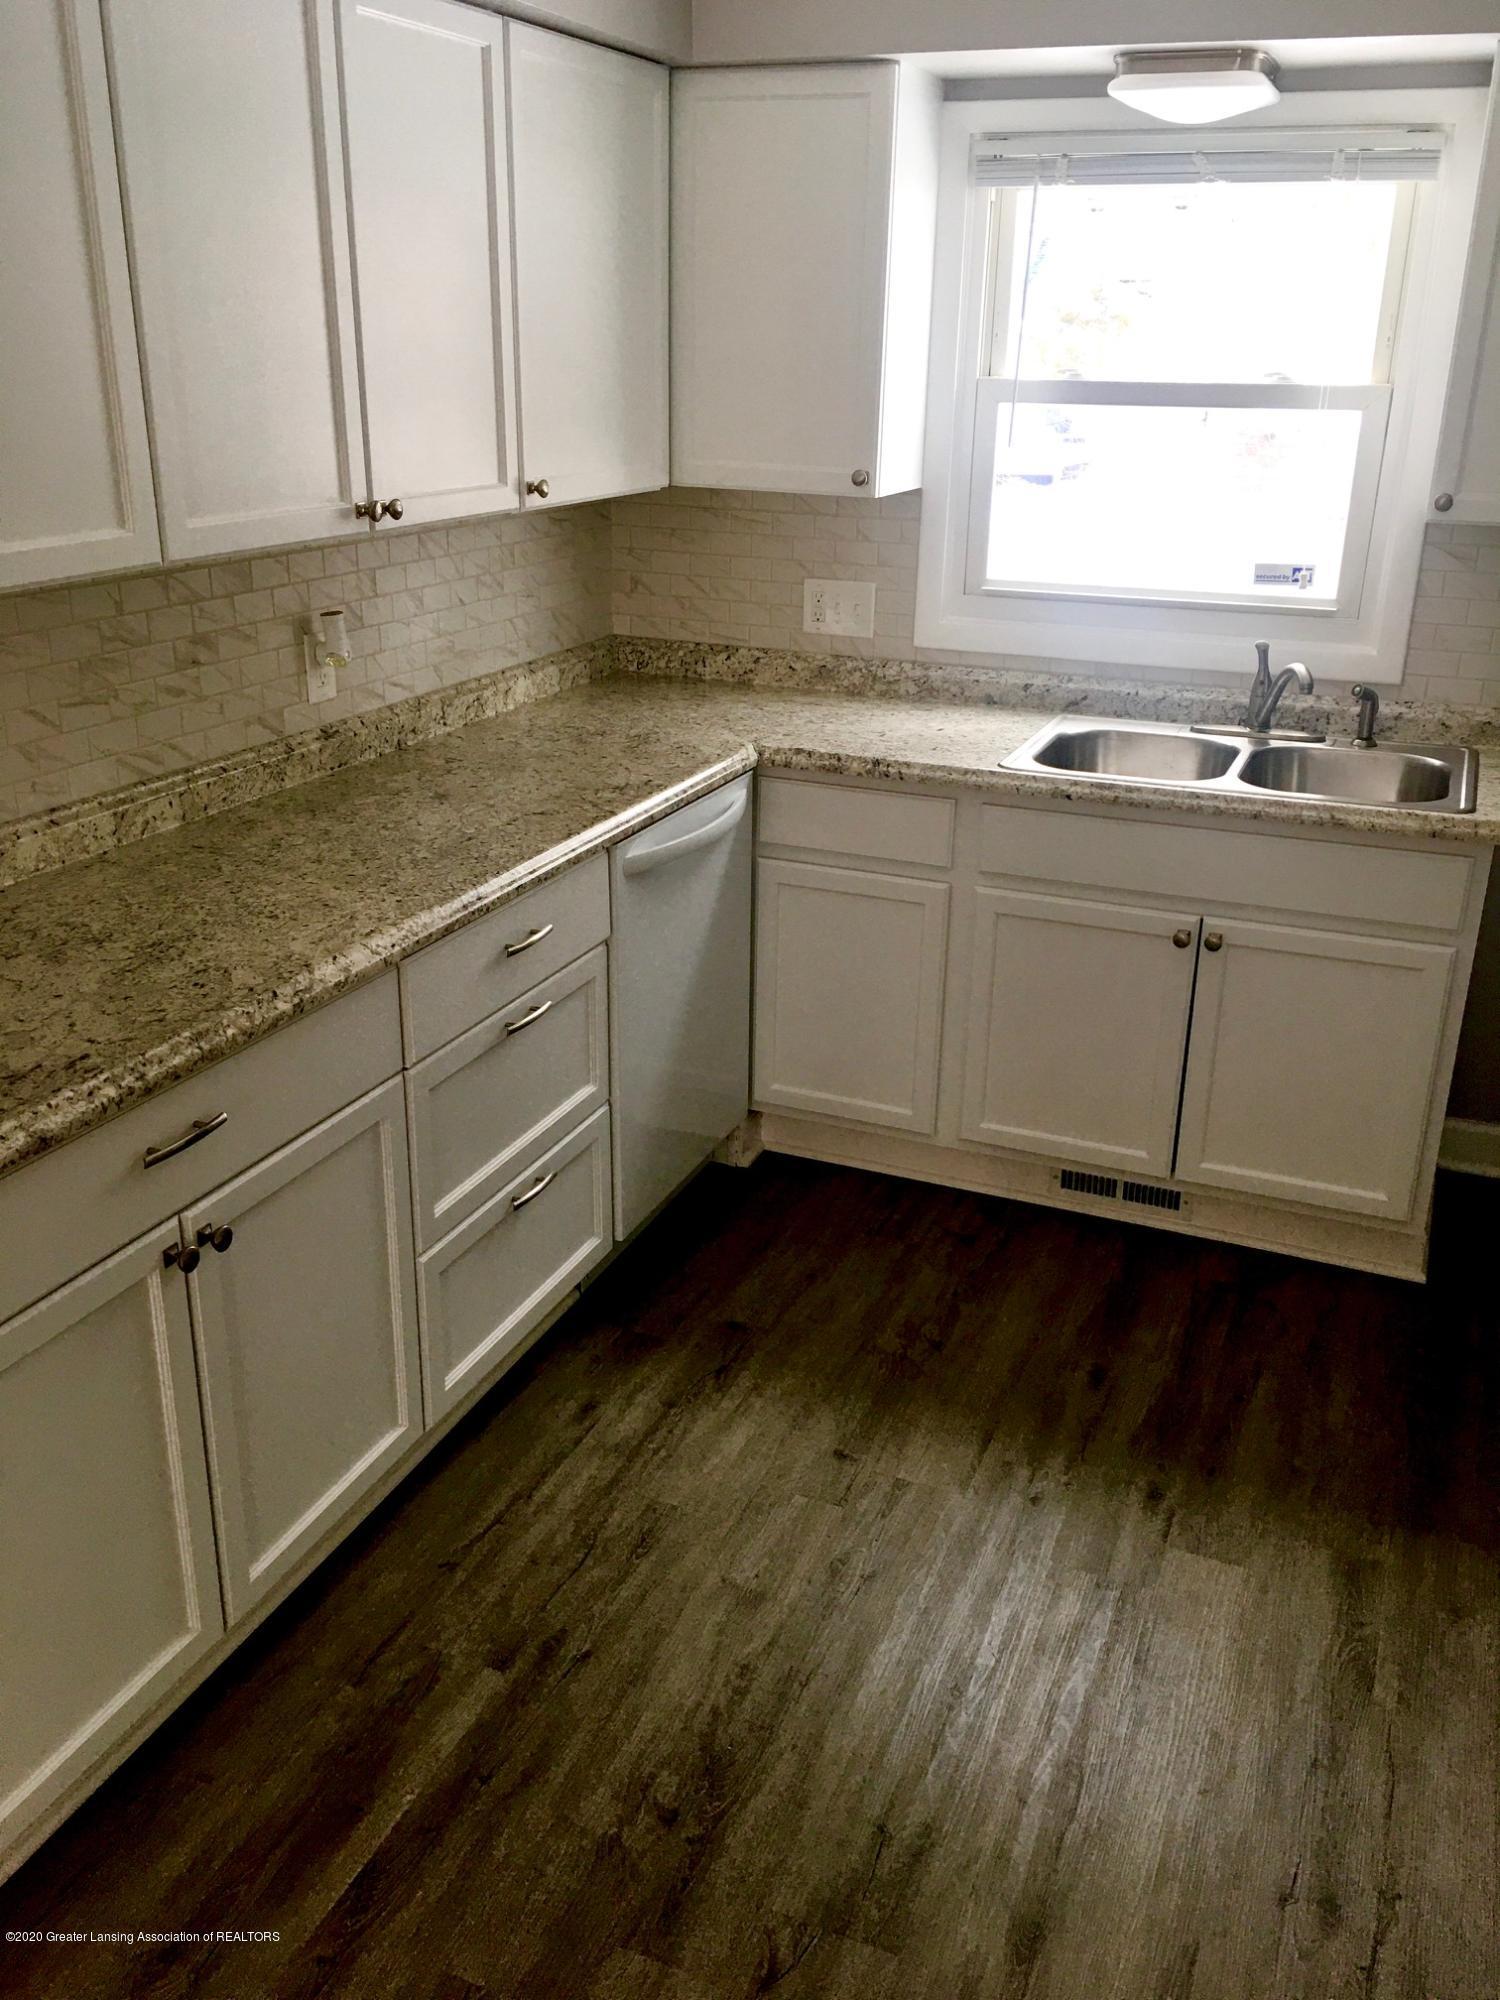 903 Tisdale Ave - Kitchen-sink-DW - 2